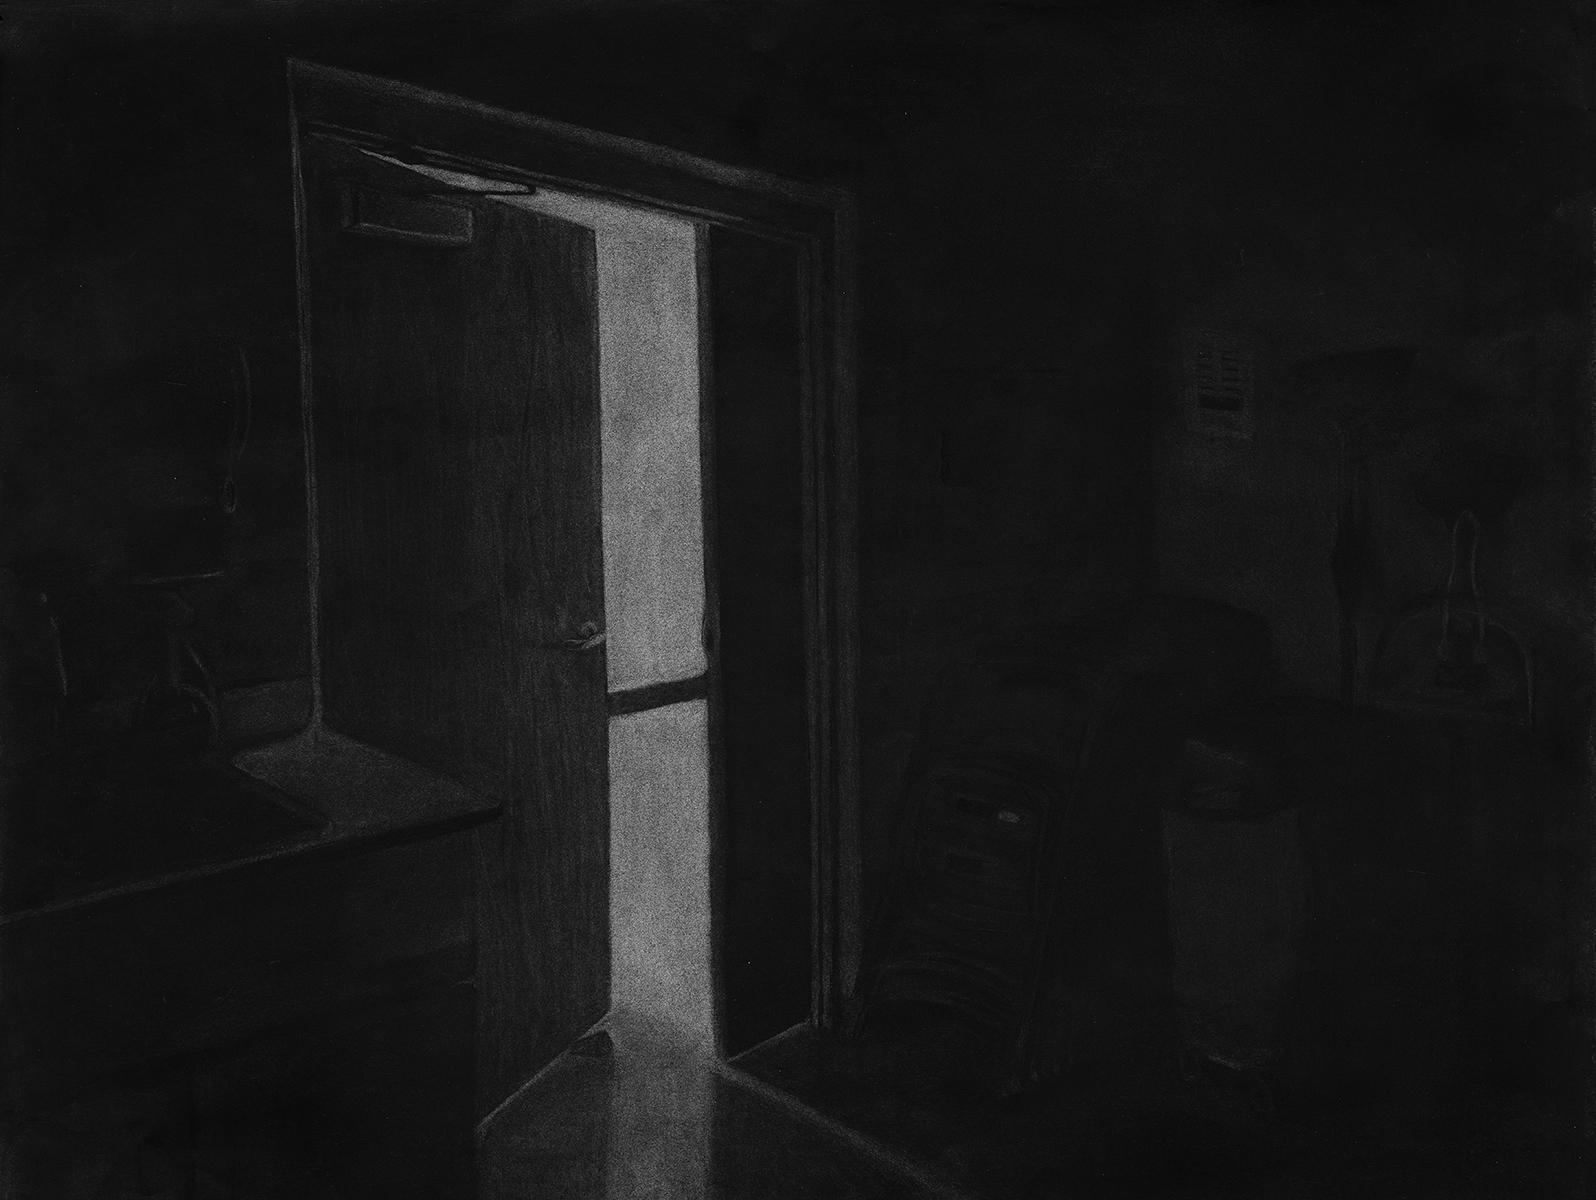 Abby Gabe, Erased Night